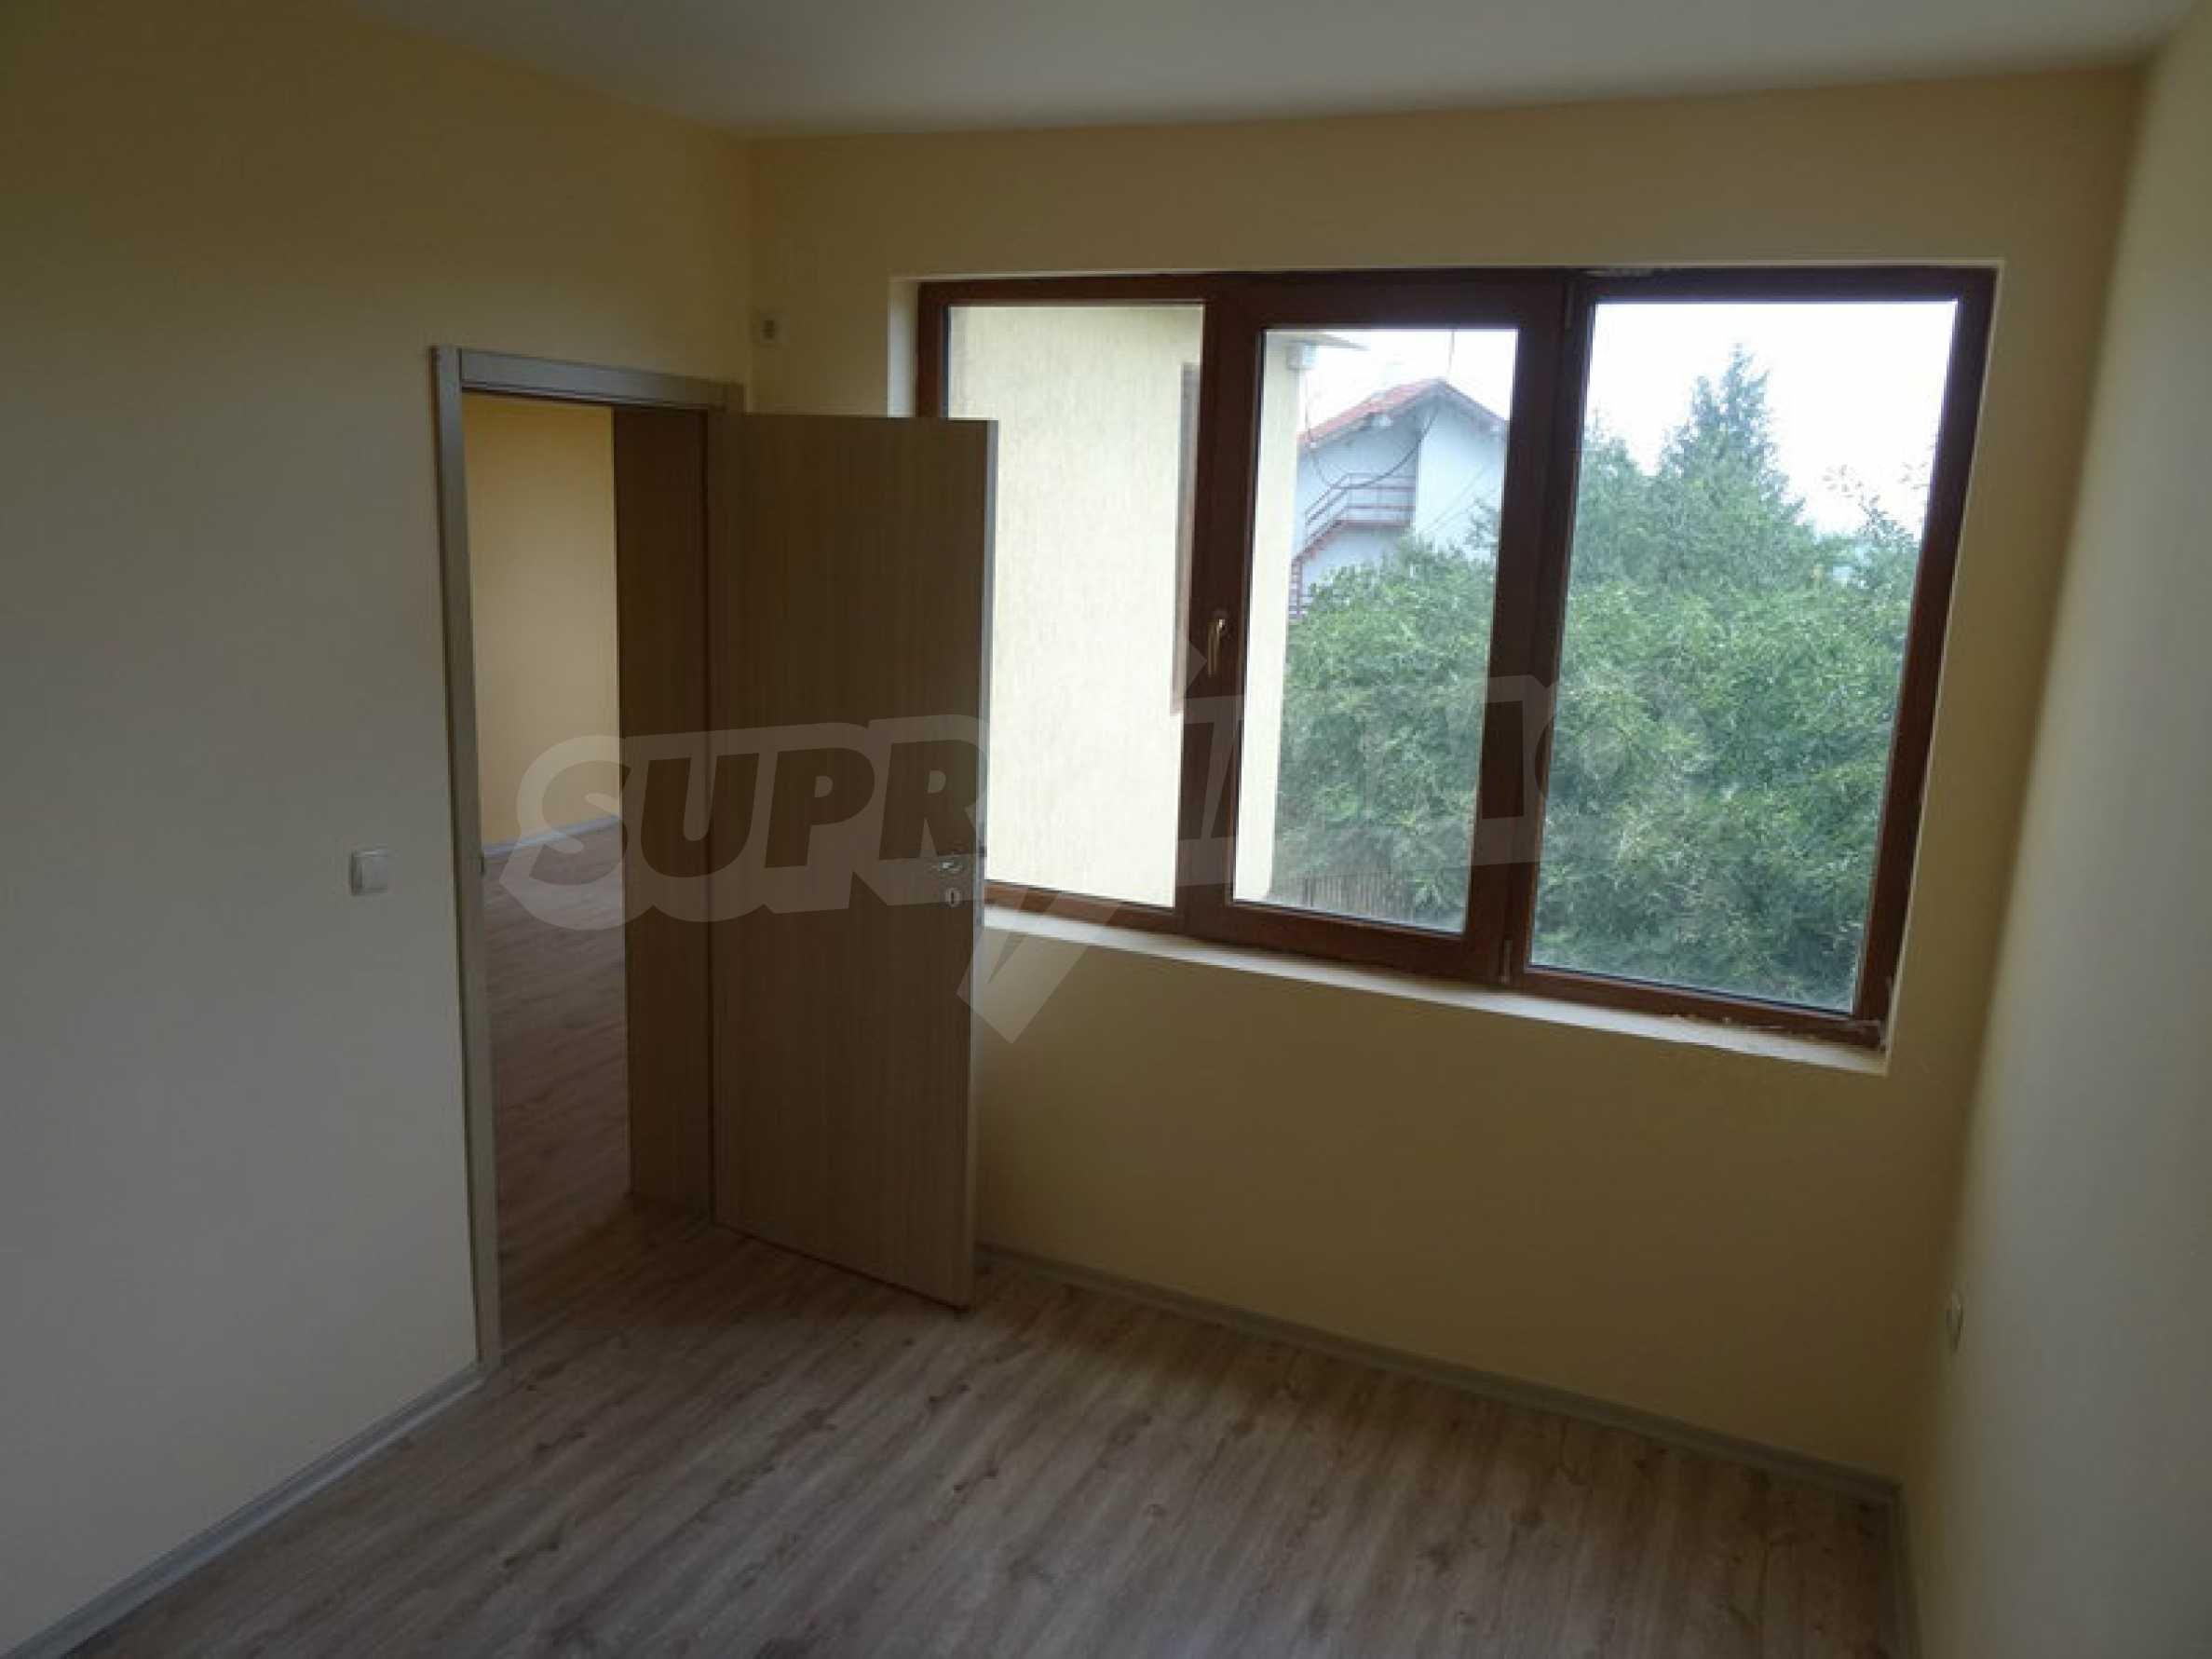 Тристаен апартамент до ключ близо до курорти Албена и Кранево 5